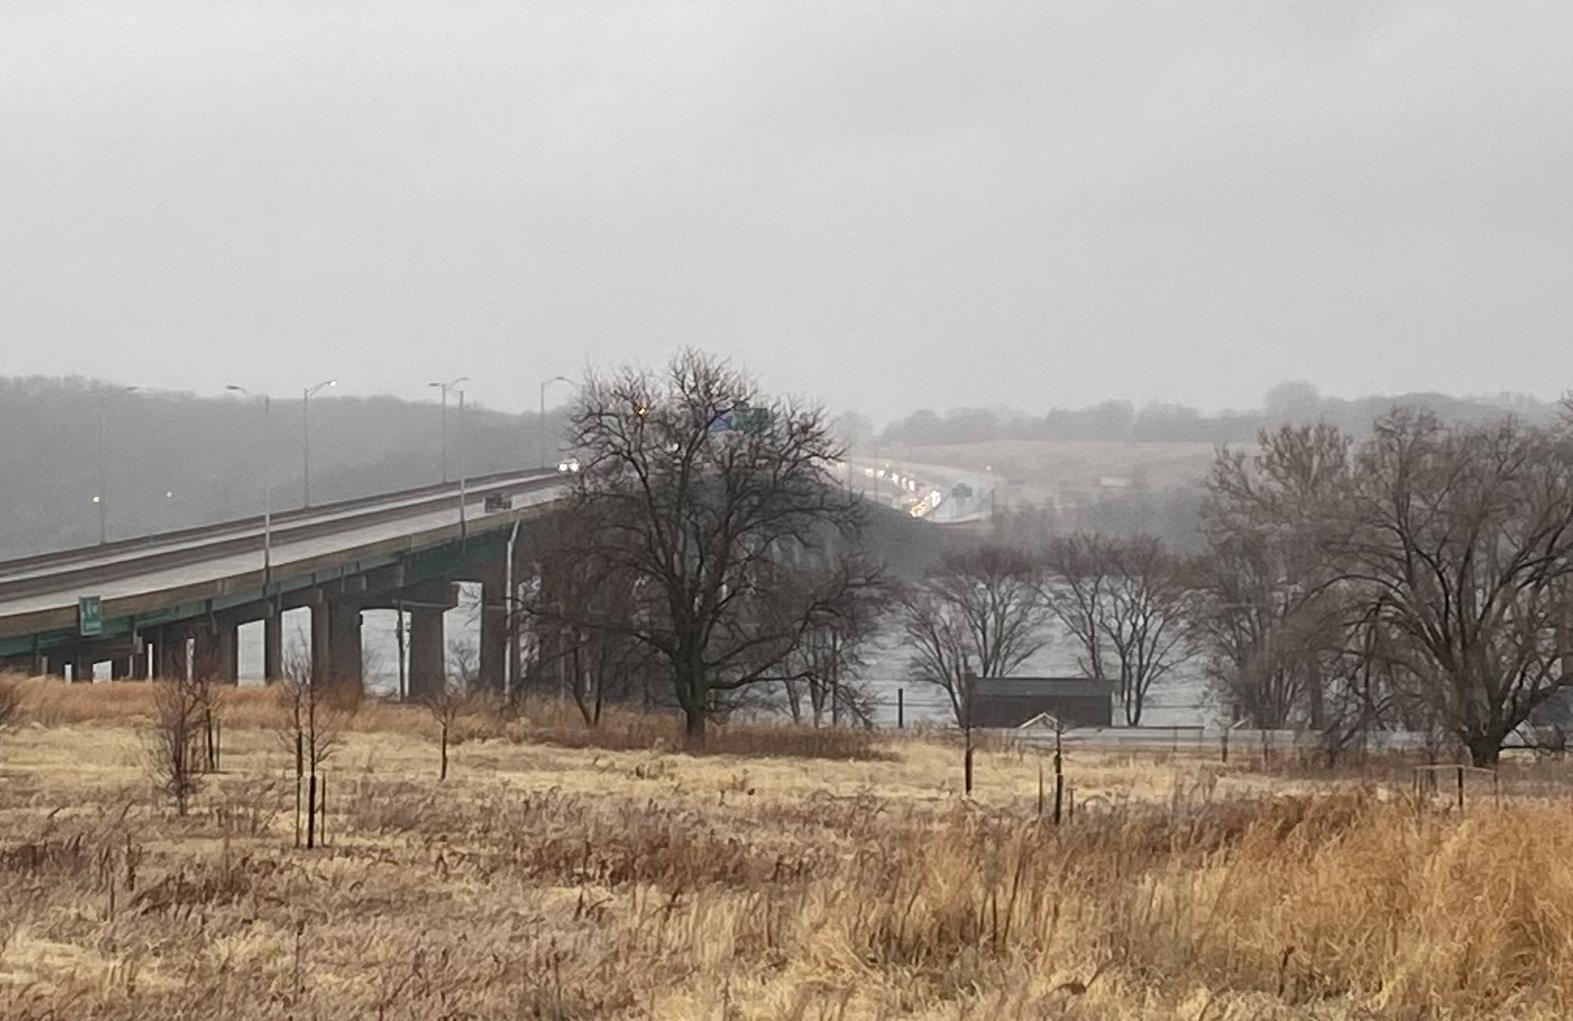 Traffic backup on the 1-80 Bridge near LeClaire, Iowa on Januray 11, 2020 (Joshua Vinson, Ourquadcities.com))